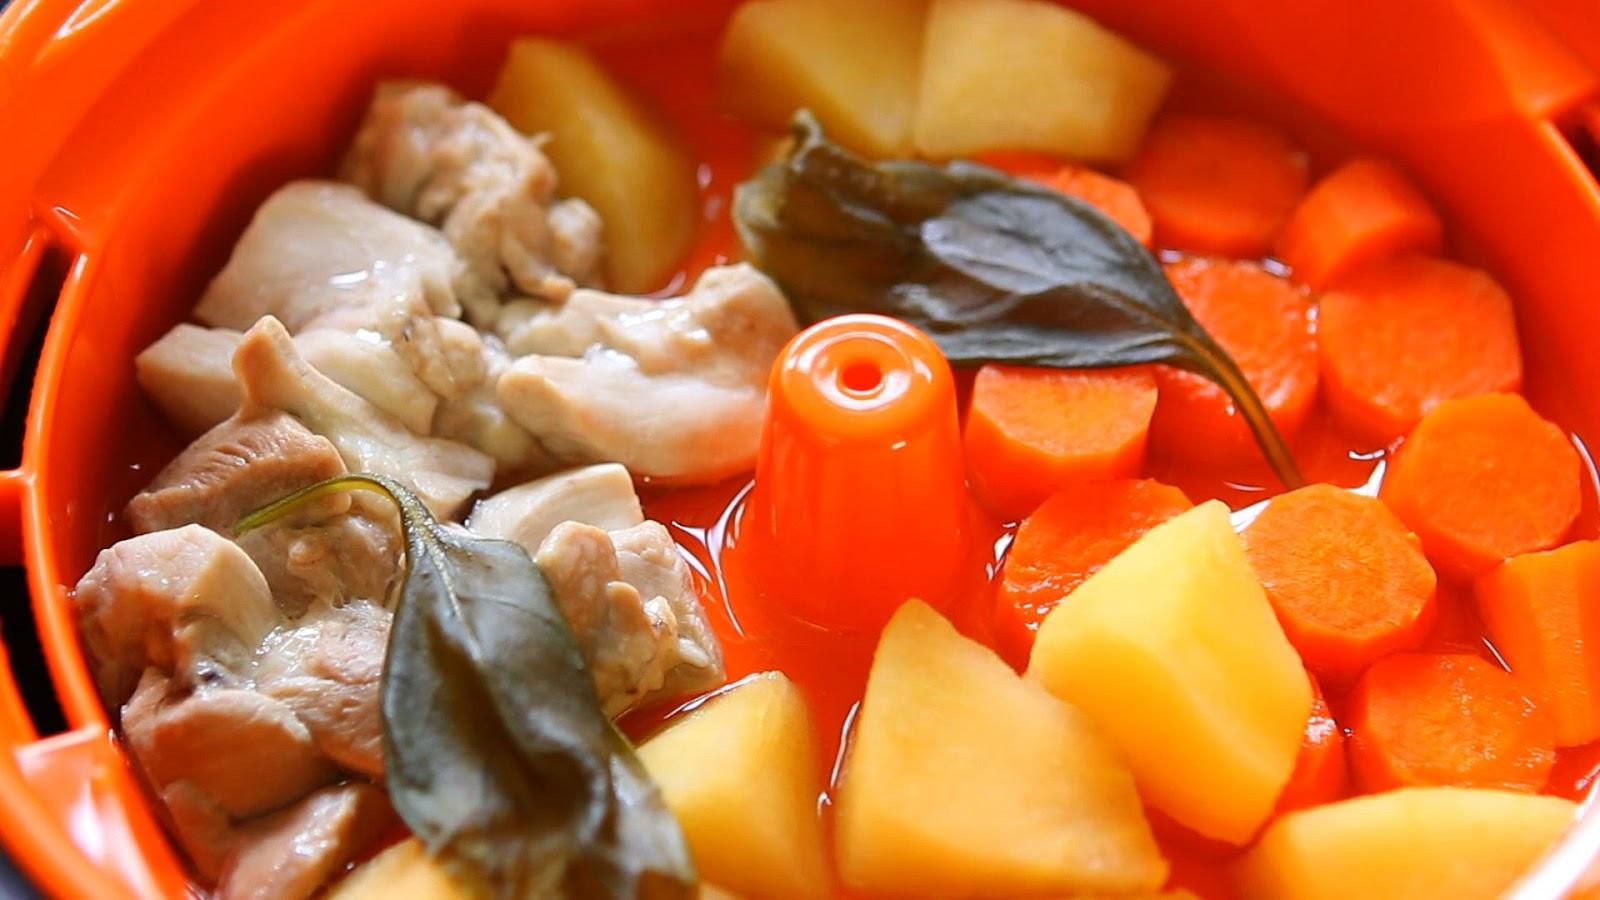 BASIC CHICKEN BABY FOOD RECIPE